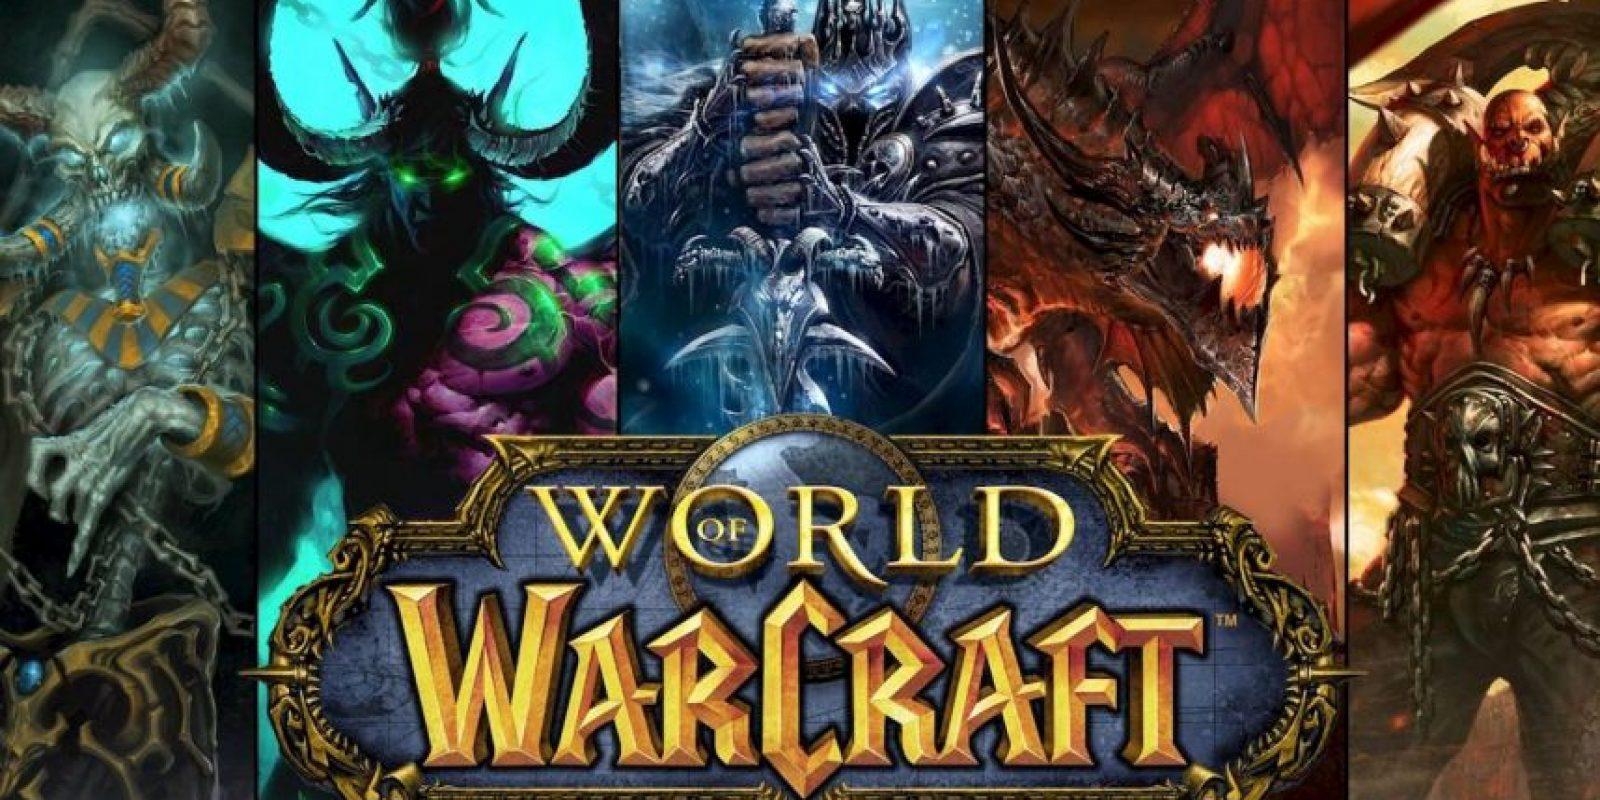 World of Warcraft Foto:Blizzard Entertainment